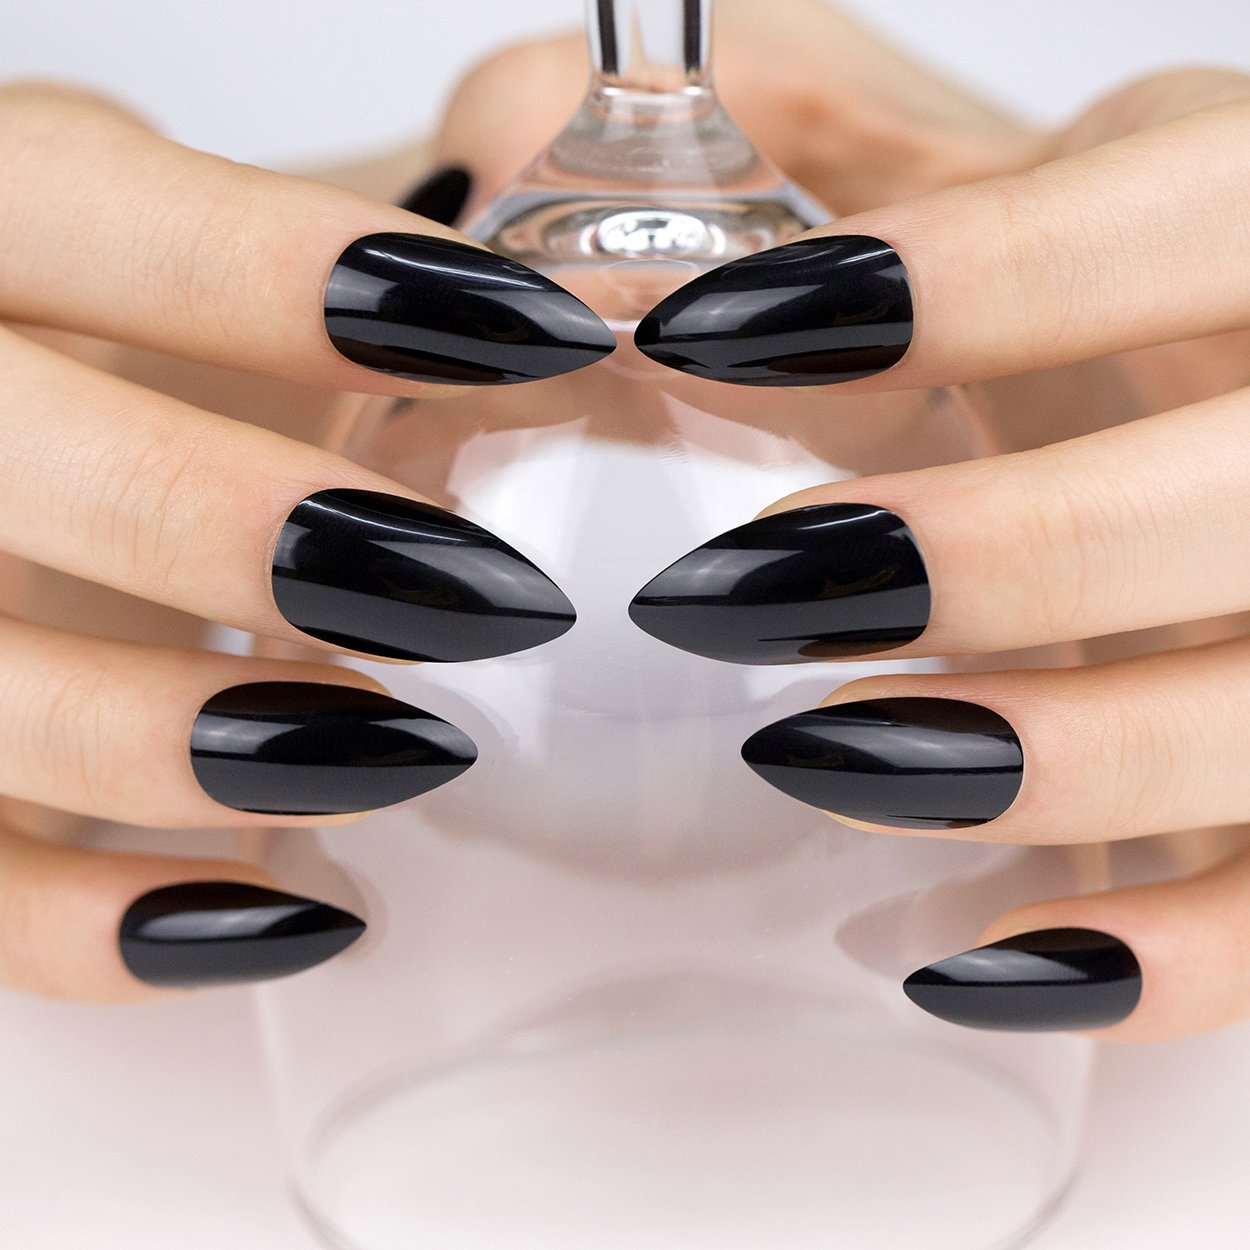 ArtPlus Black Gel Fake Nails Kit Stilleto Full Cover with Glue 24pcs ...